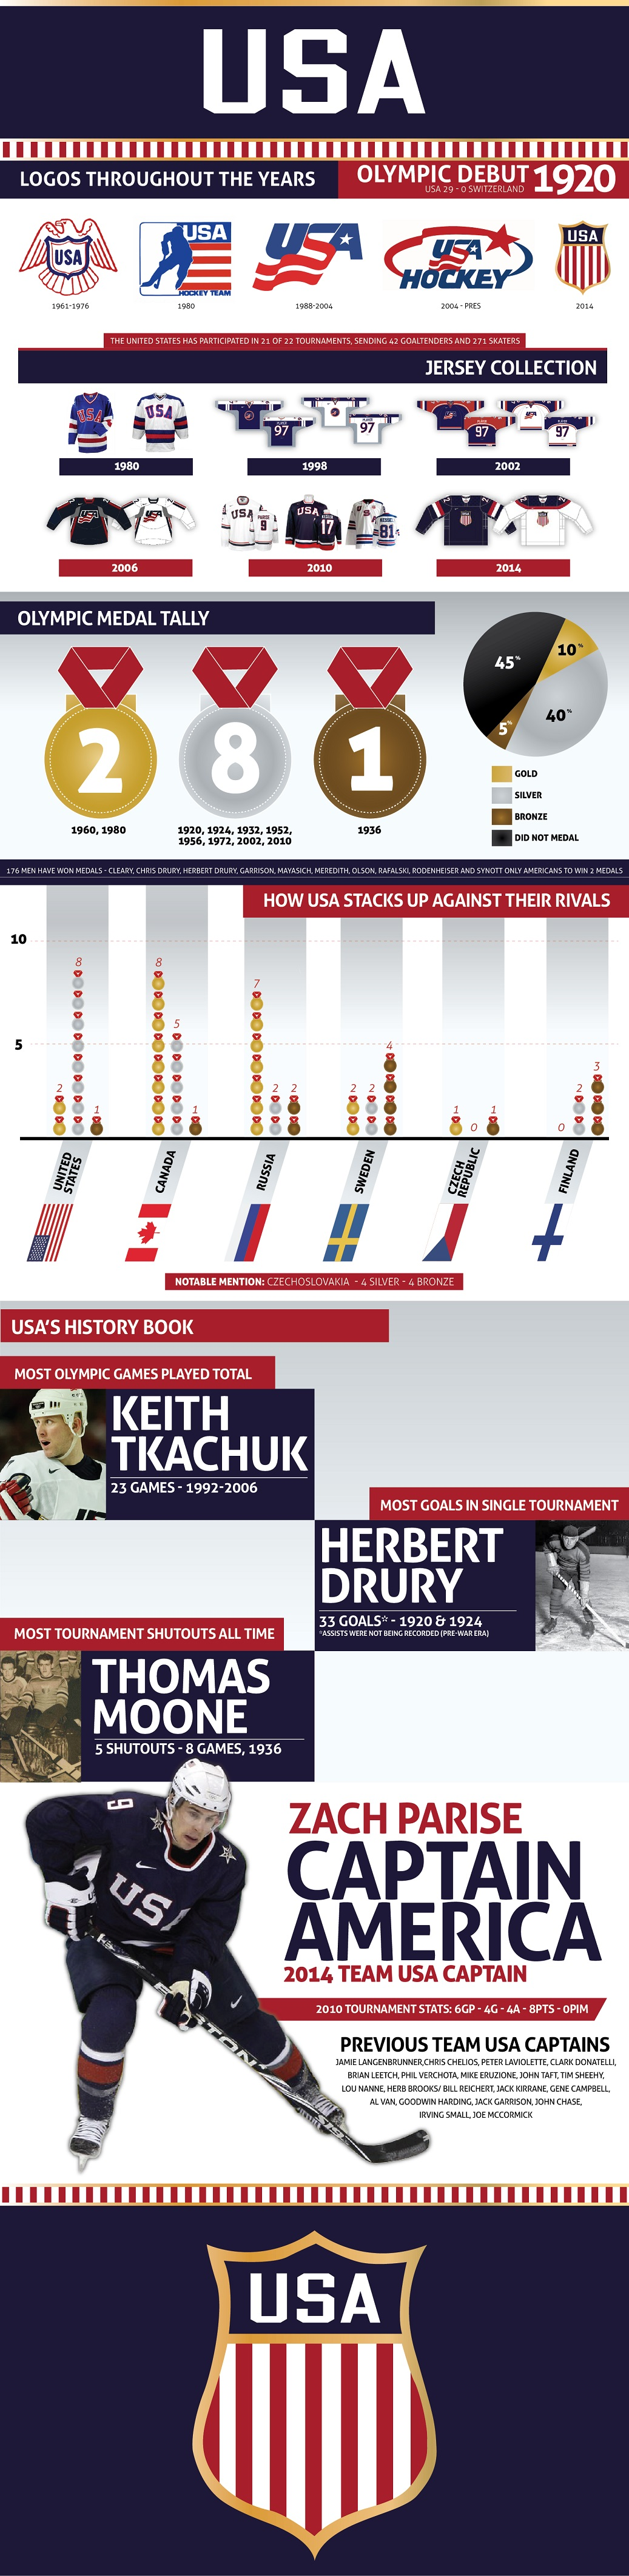 USAHockeyIG